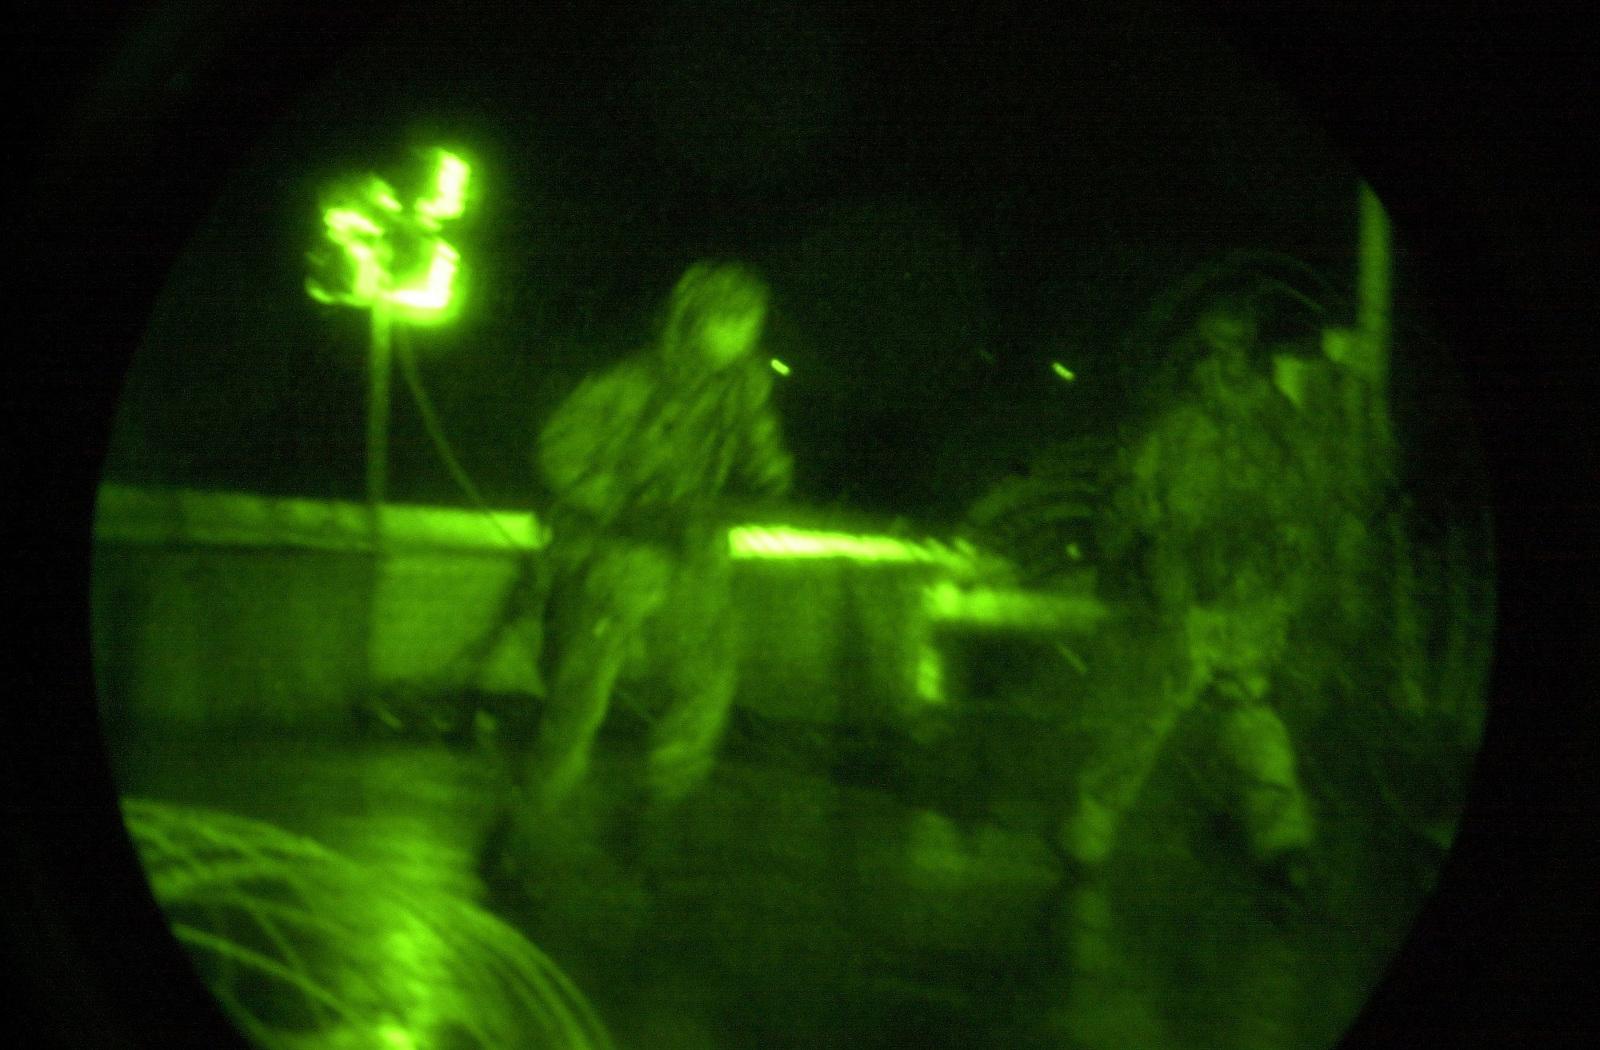 Light enhanced photography showing a US Marine Corps (USMC